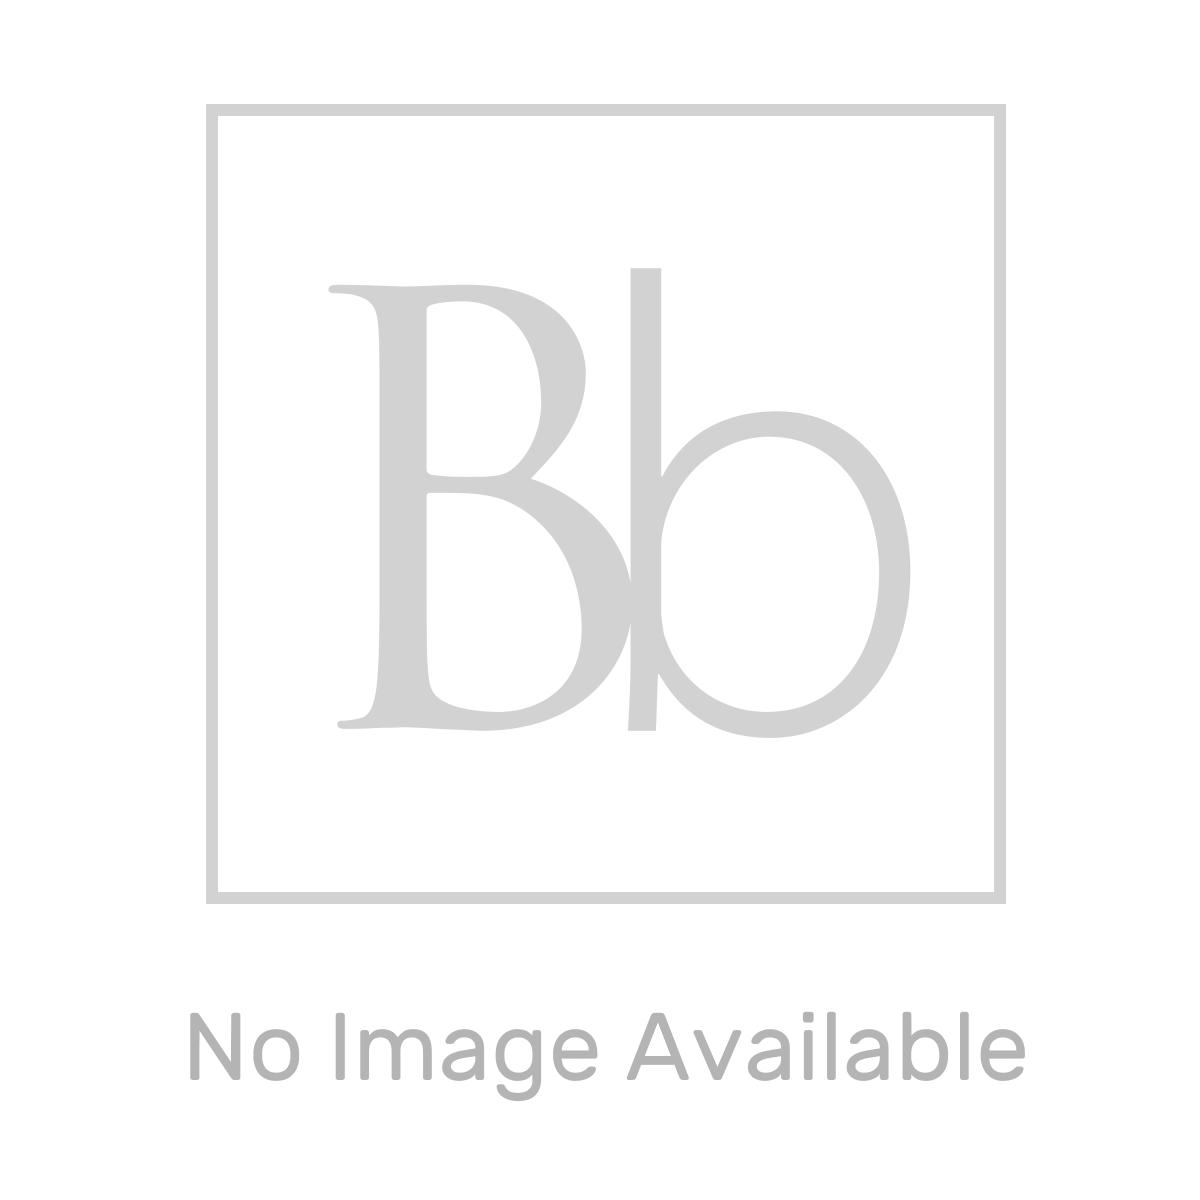 Aquadart Grey Slate Shower Tray 1600 x 800